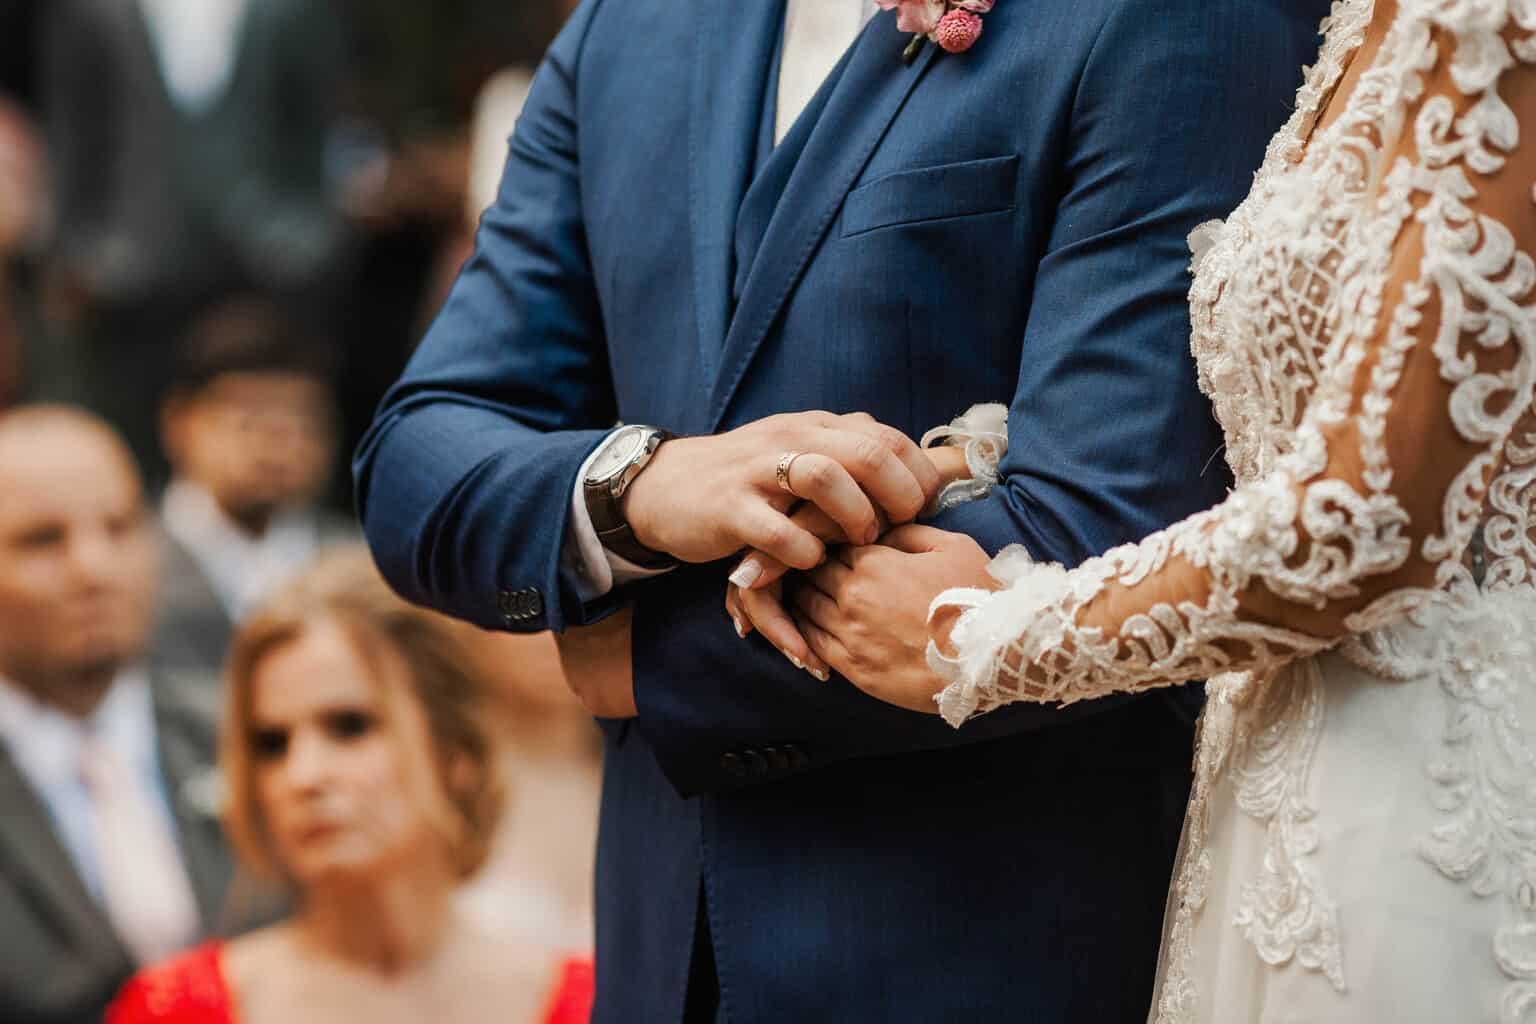 casamento-Beatriz-e-Joao-Fernando-cerimonia-ao-ar-livre-Itaipava-Locanda-Della-Mimosa-Thienny-Tammis161